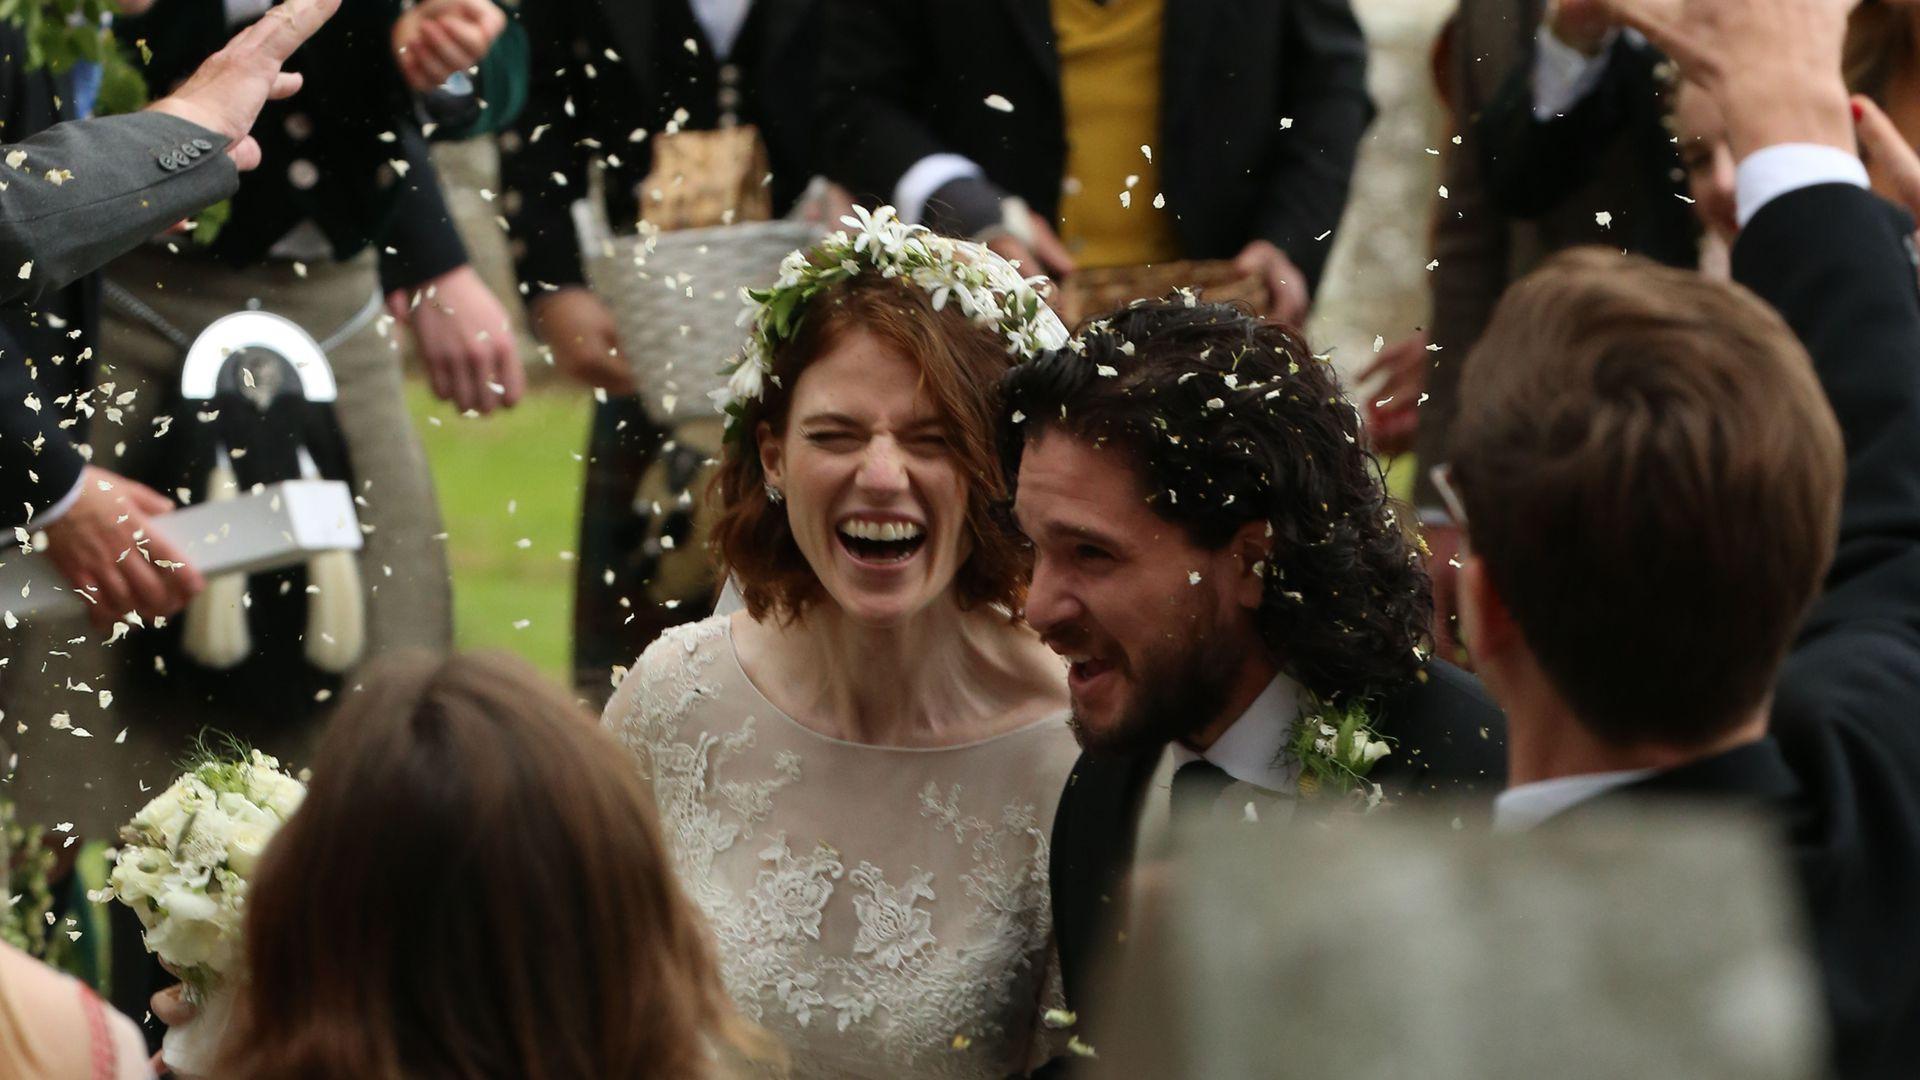 Hochzeit Kit Harington  Hochzeits Eindringling GoT Fan filmte Kit Harington